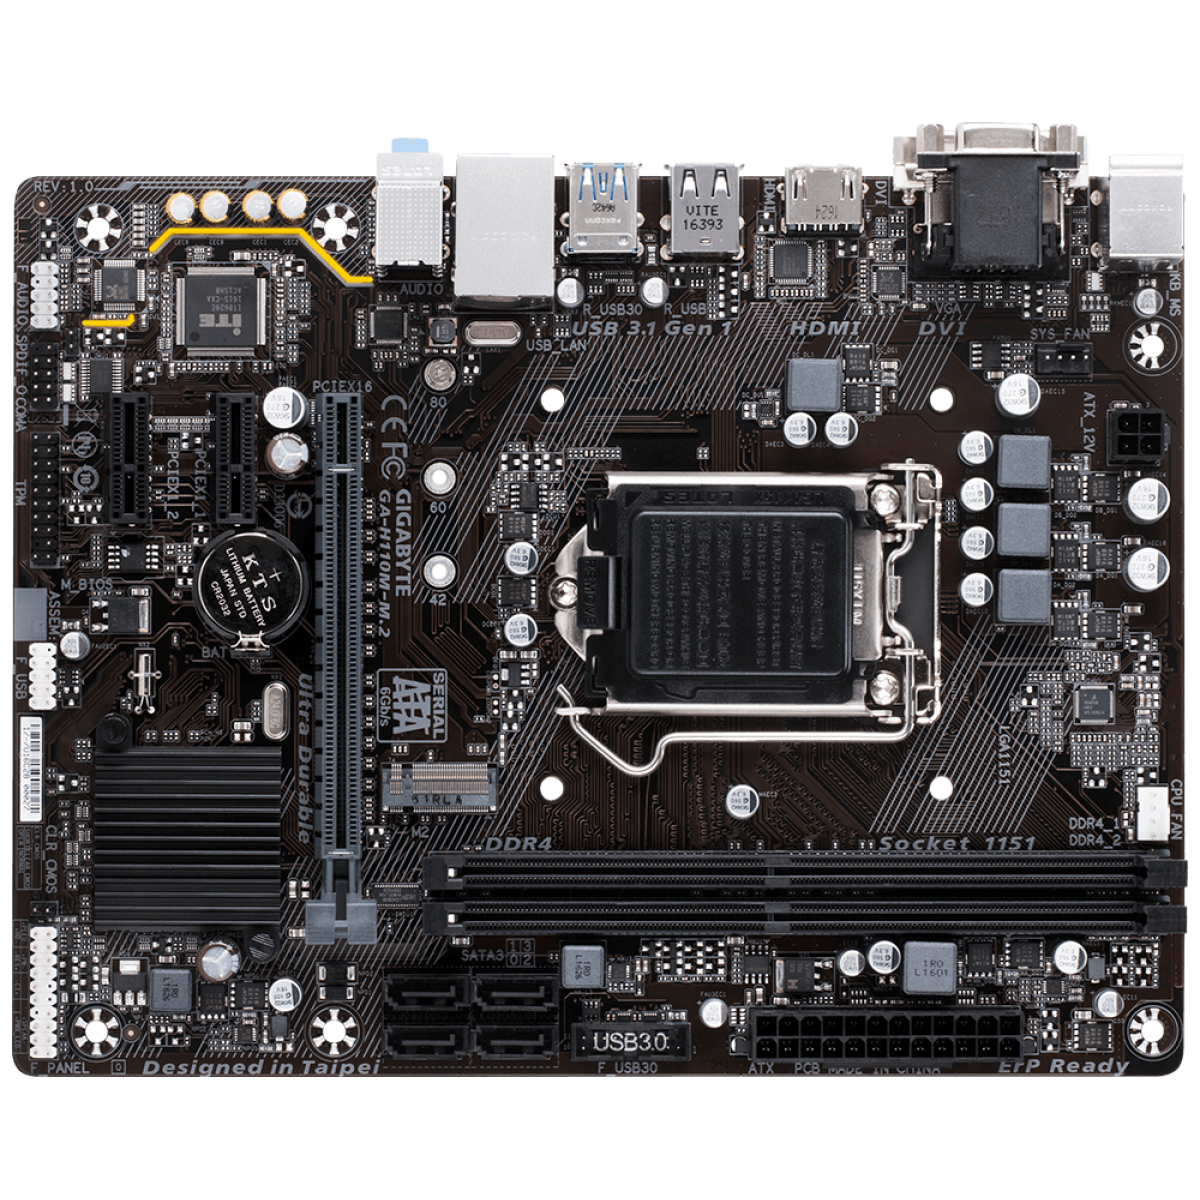 Placa Mãe Gigabyte GA-H110M-M2, Chipset H110, Intel LGA 1151, mATX, DDR4